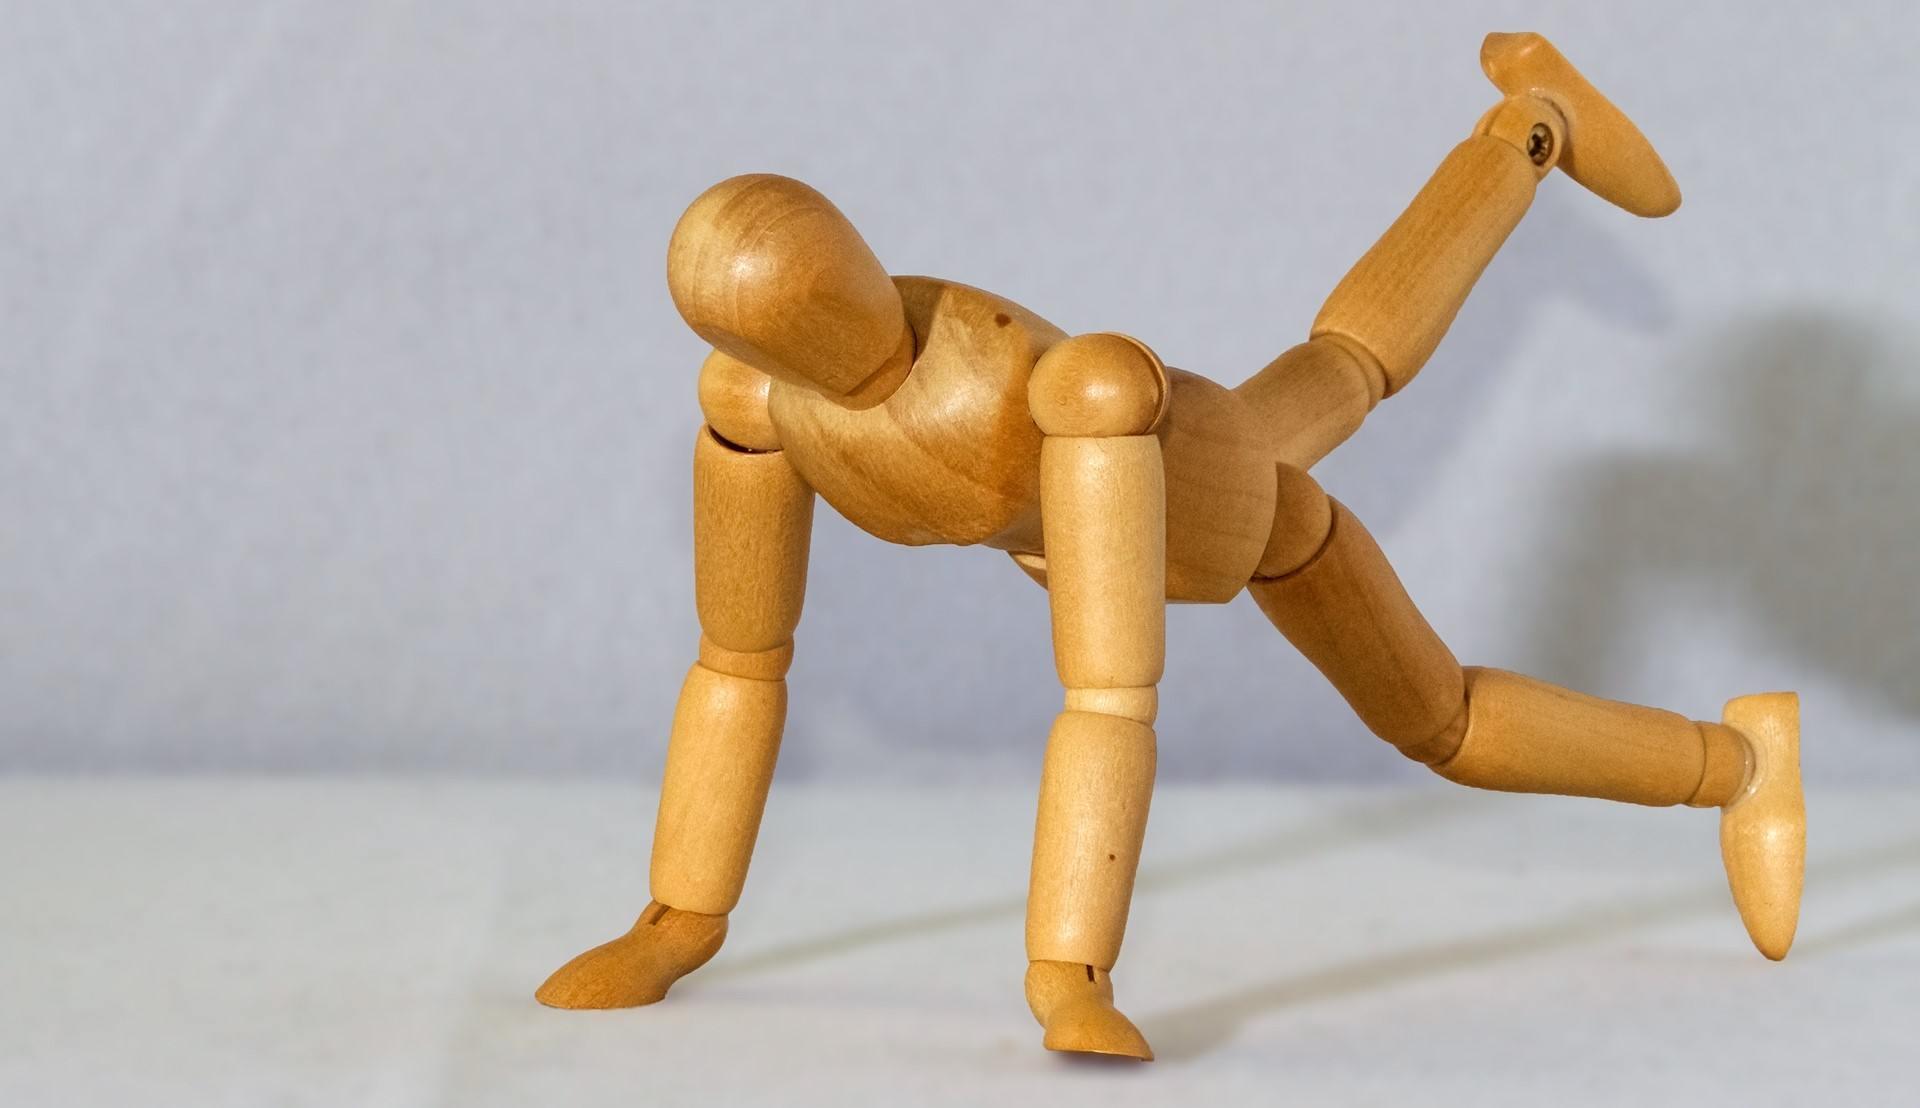 A figure doing a push-up